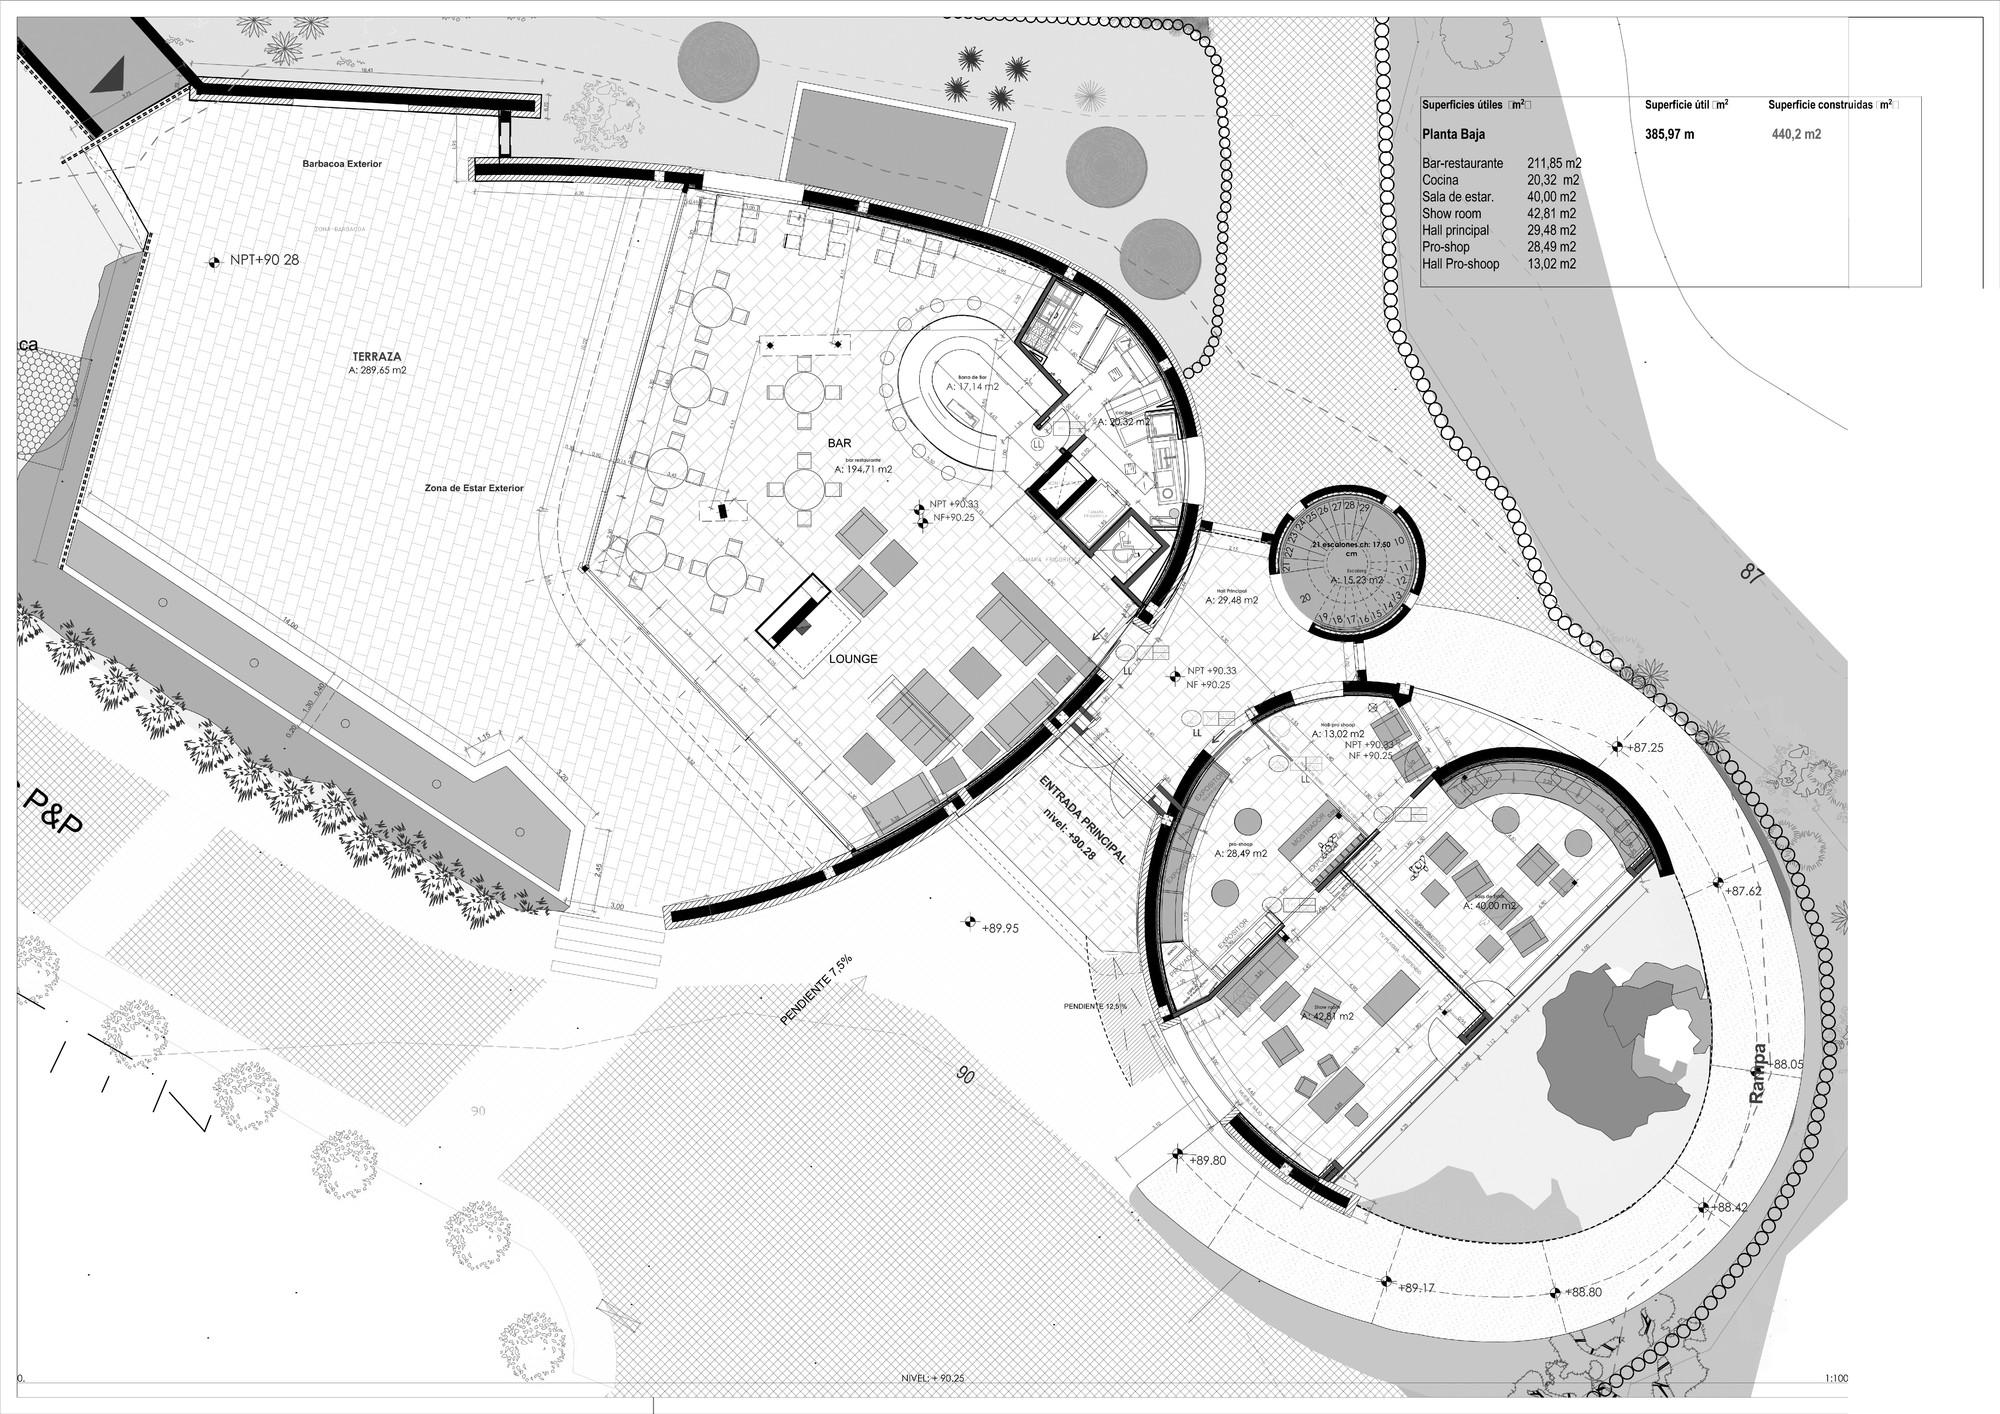 Gallery of Golf Club House La Graiera / BC Estudio ... on fitness center plans, nightclub design plans, conference room plans, parking plans, security plans, putting green plans, boat ramp plans, tree fort plans, trellis design plans,